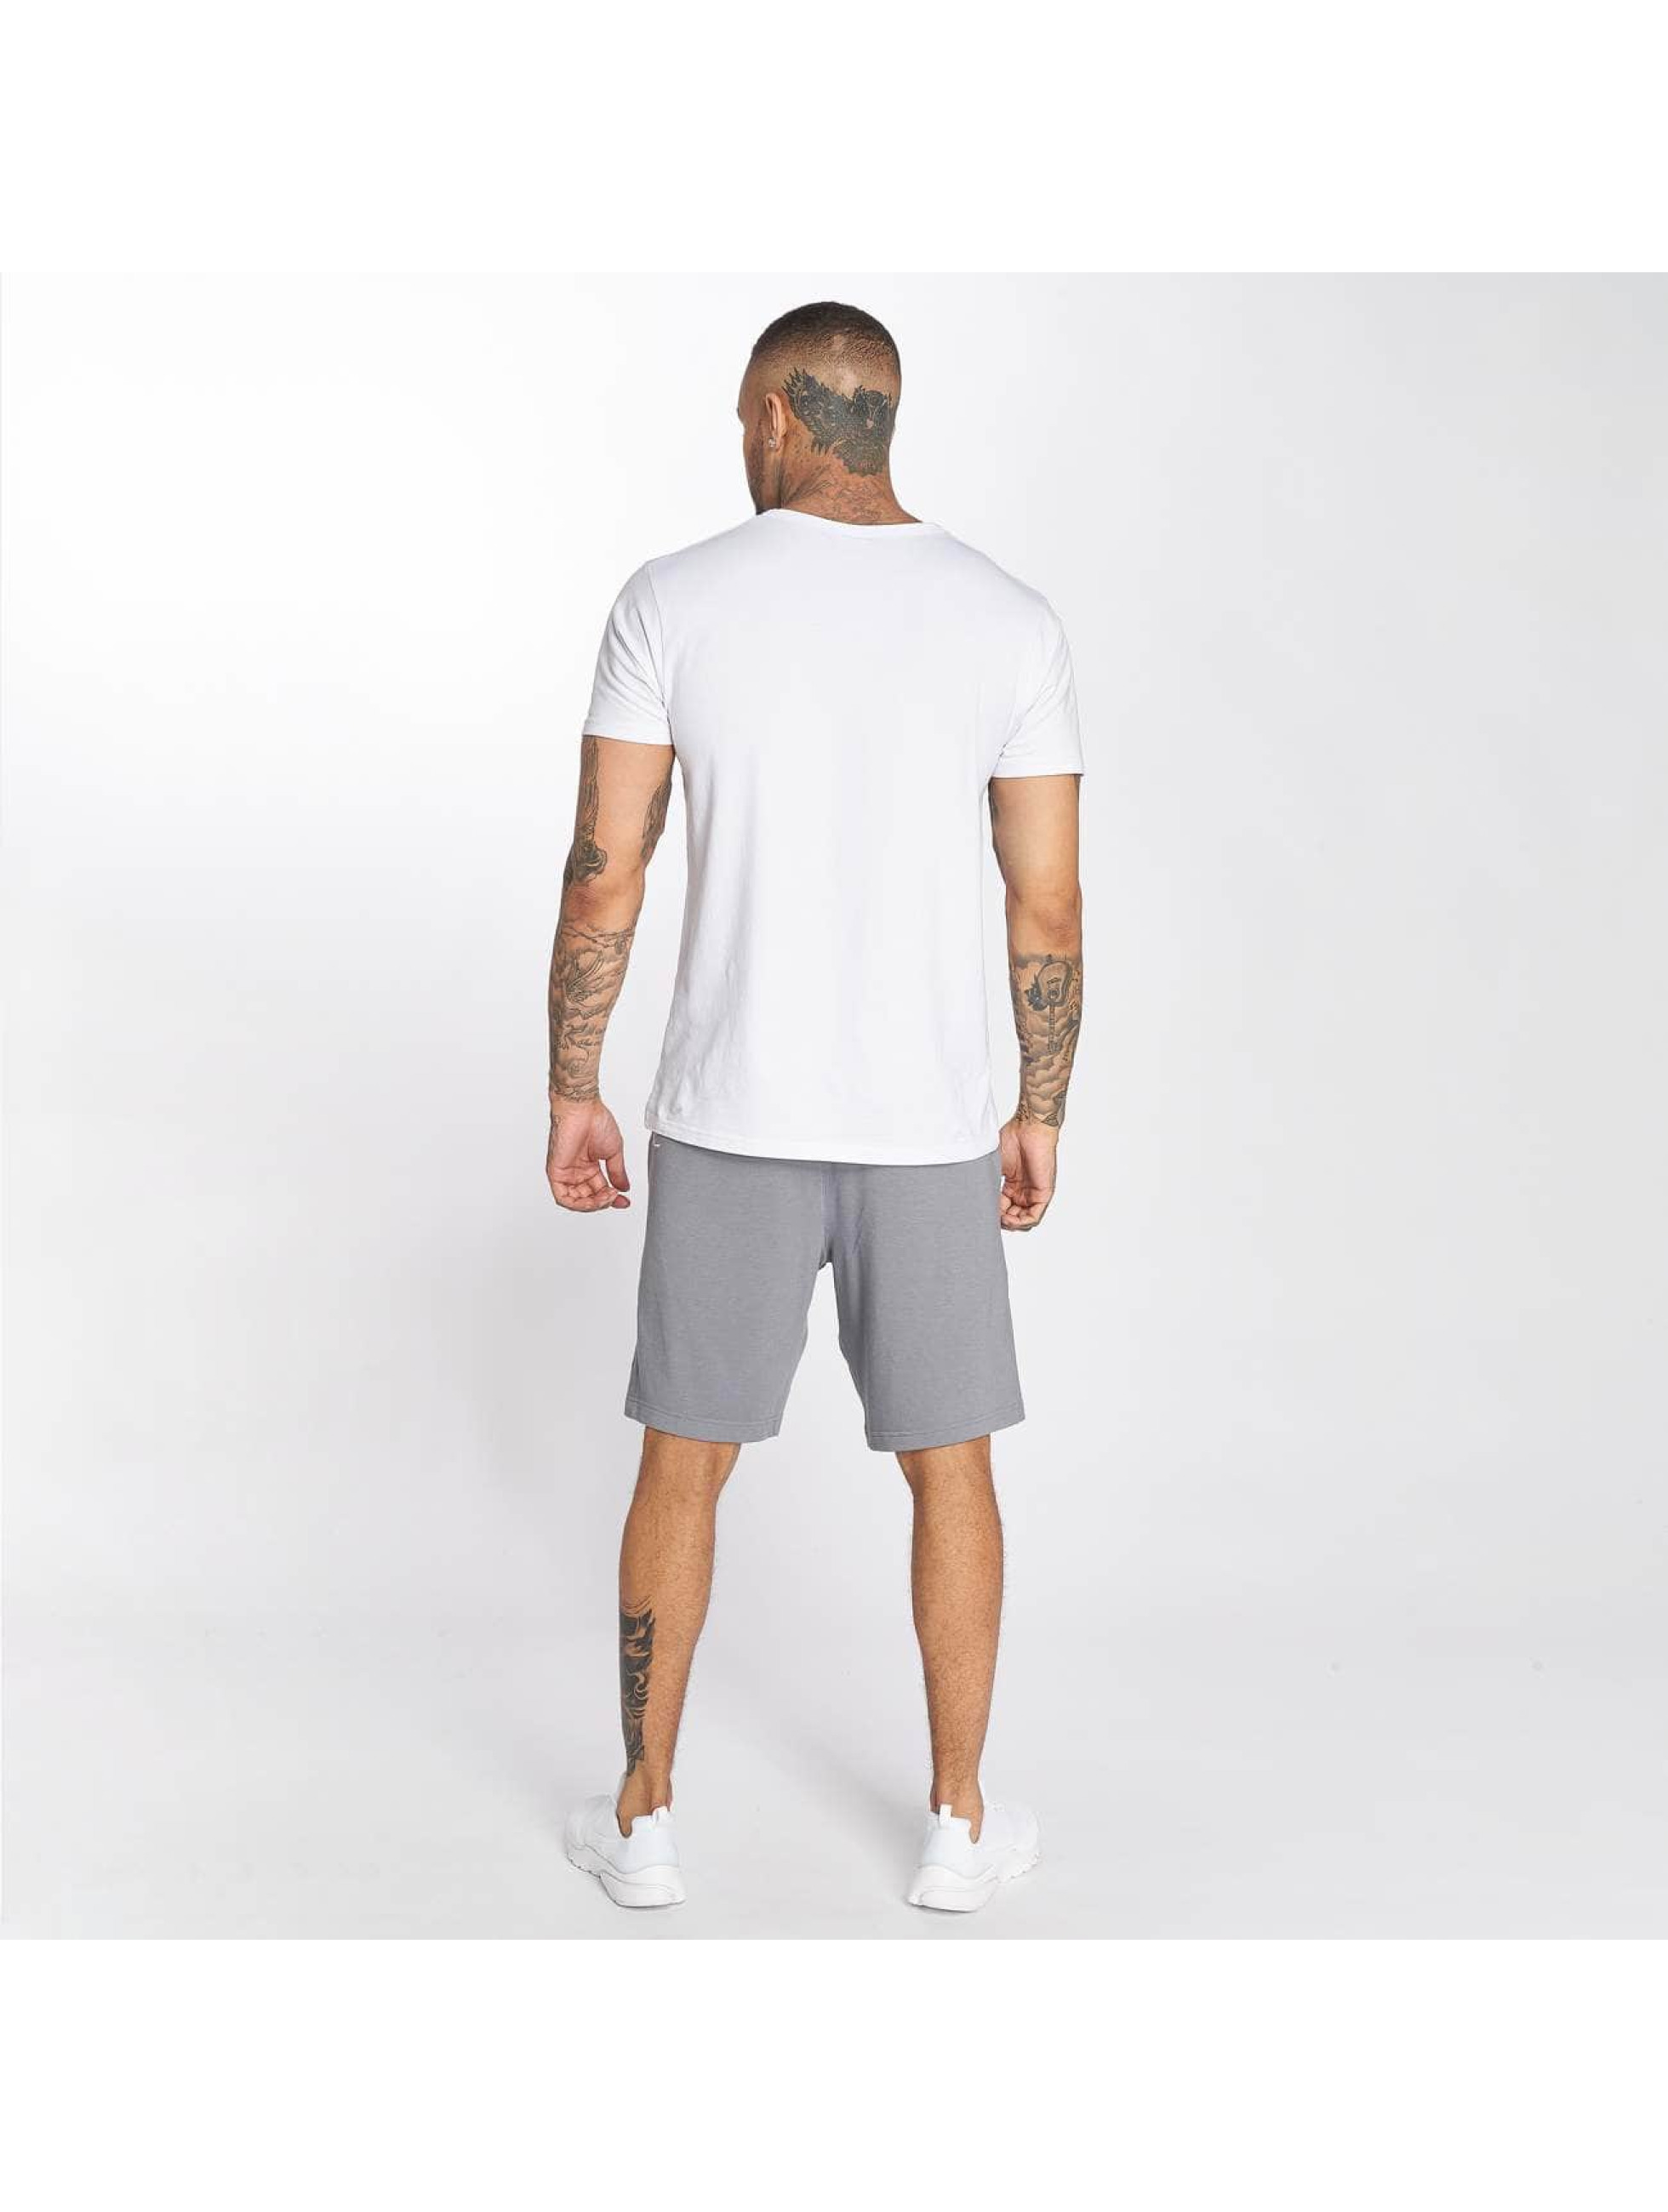 Nike Performance shorts Dry Training grijs